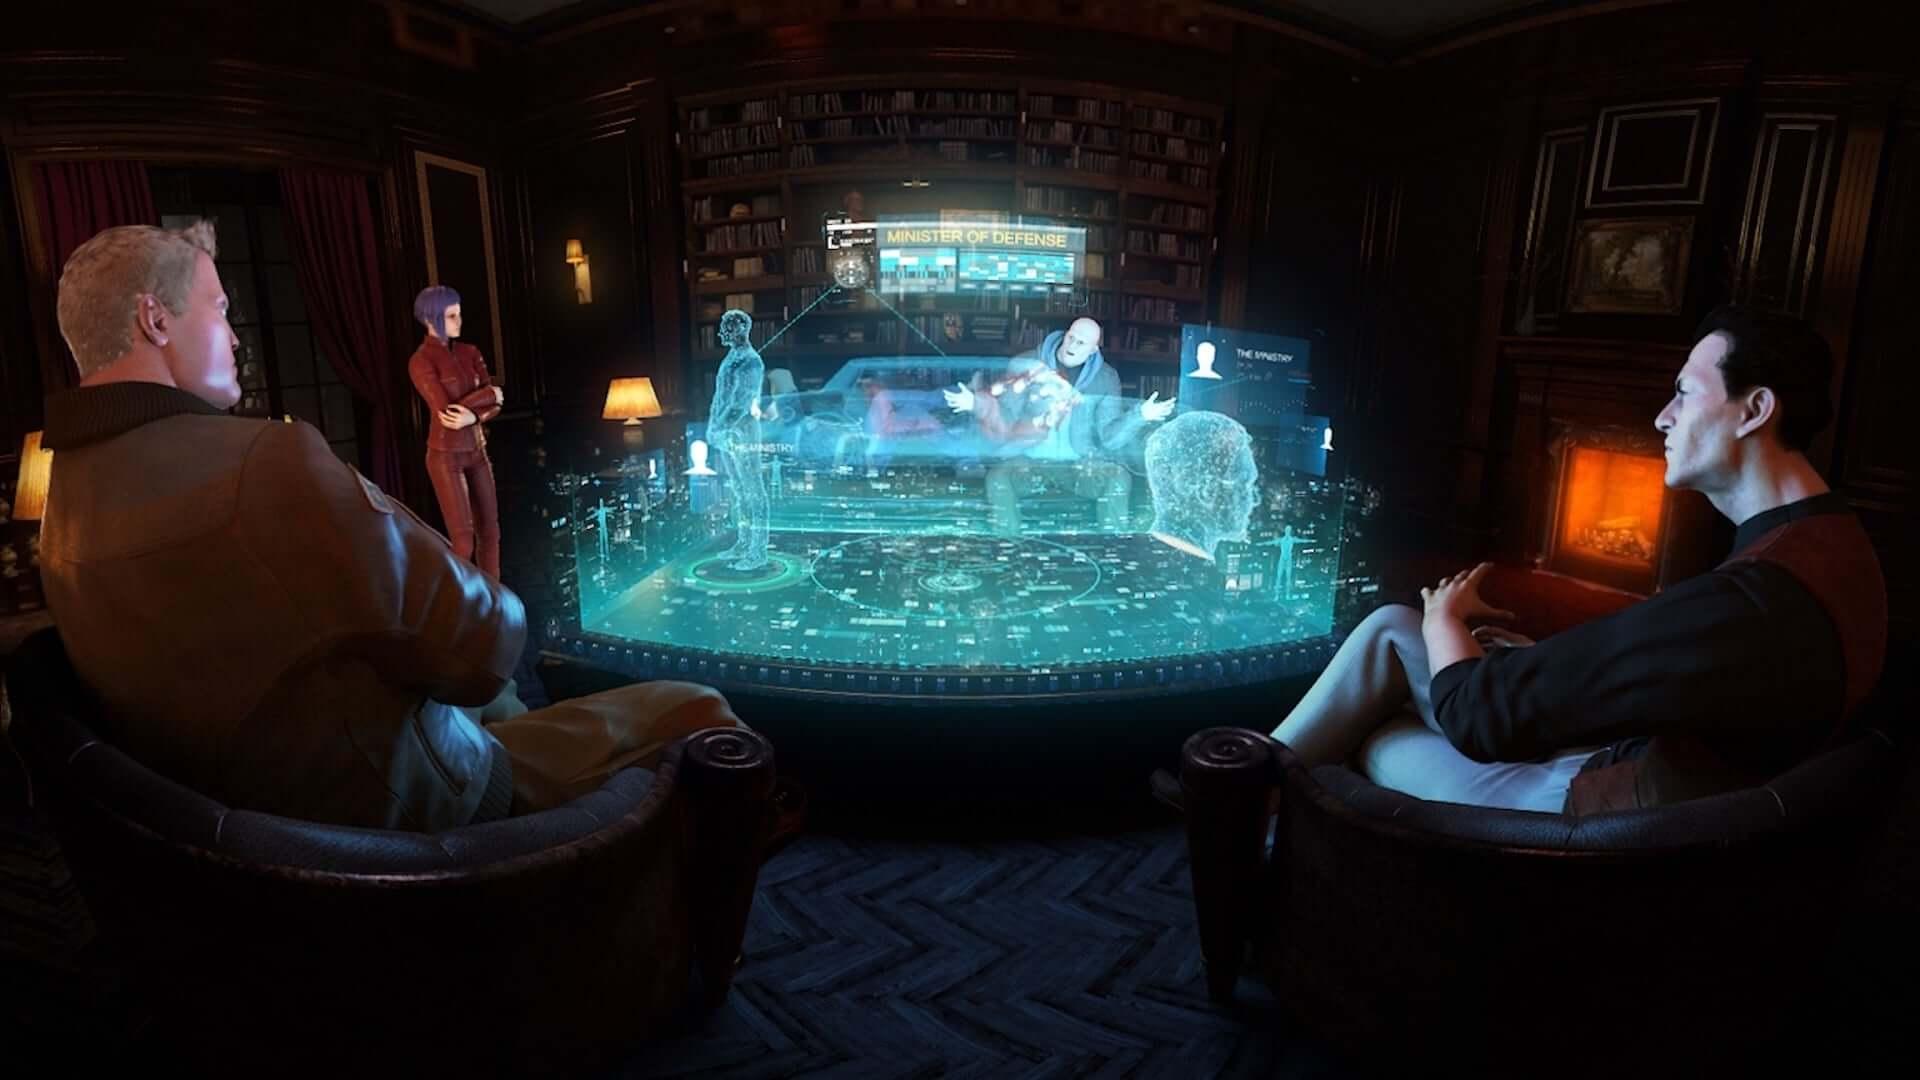 VR作品としては日本初!『攻殻機動隊 GHOST CHASER』が<第76回ベネチア国際映画祭>に正式招待 film190725ghost-chaser_2-1920x1080